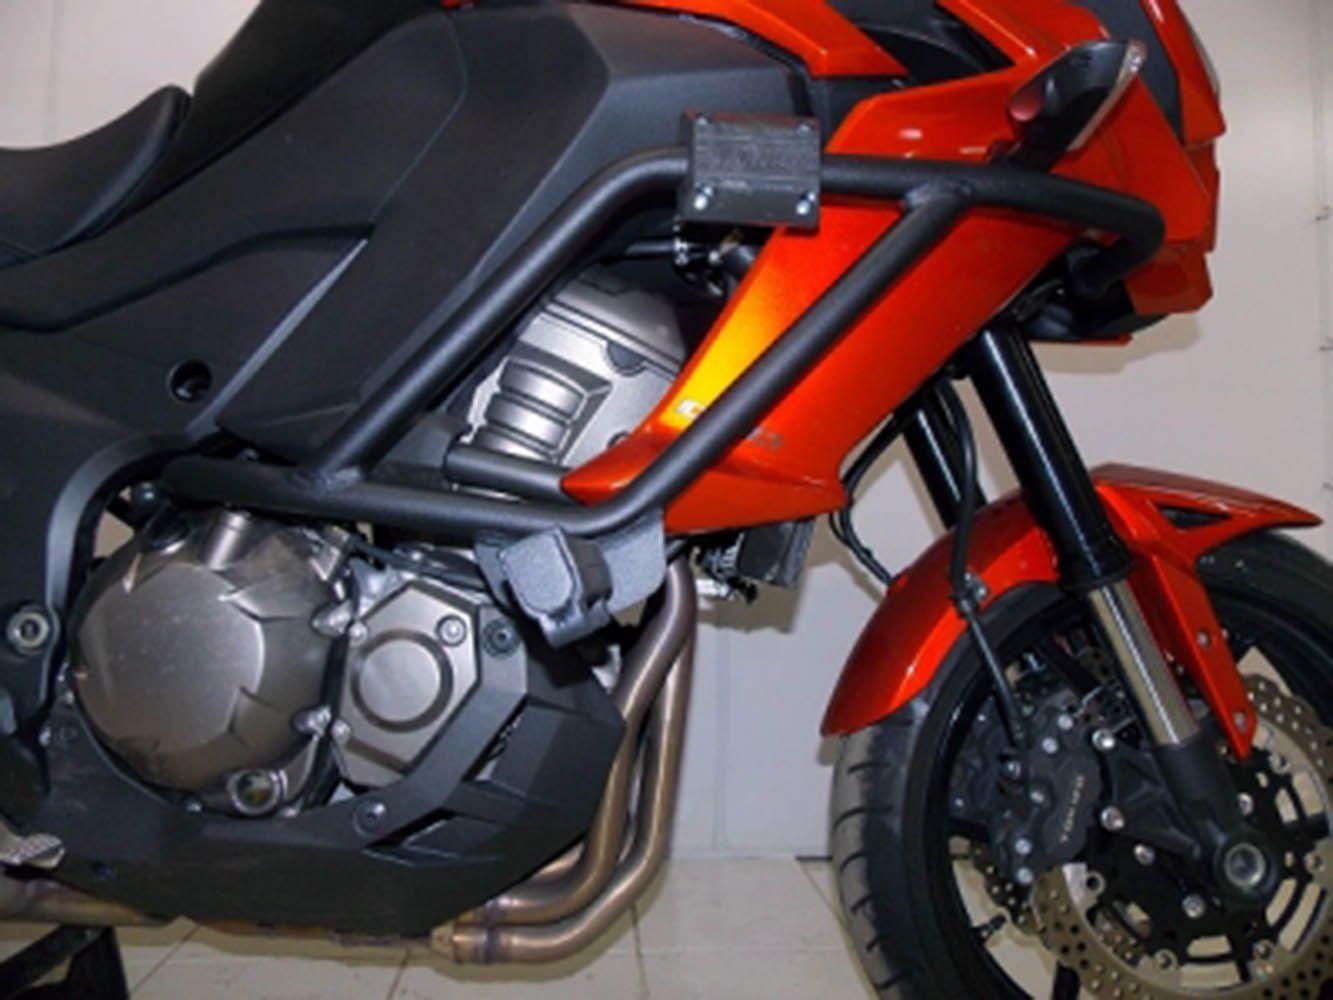 Protetor Motor Perna Carenagem Versys 1000 2016 Chapam 10129